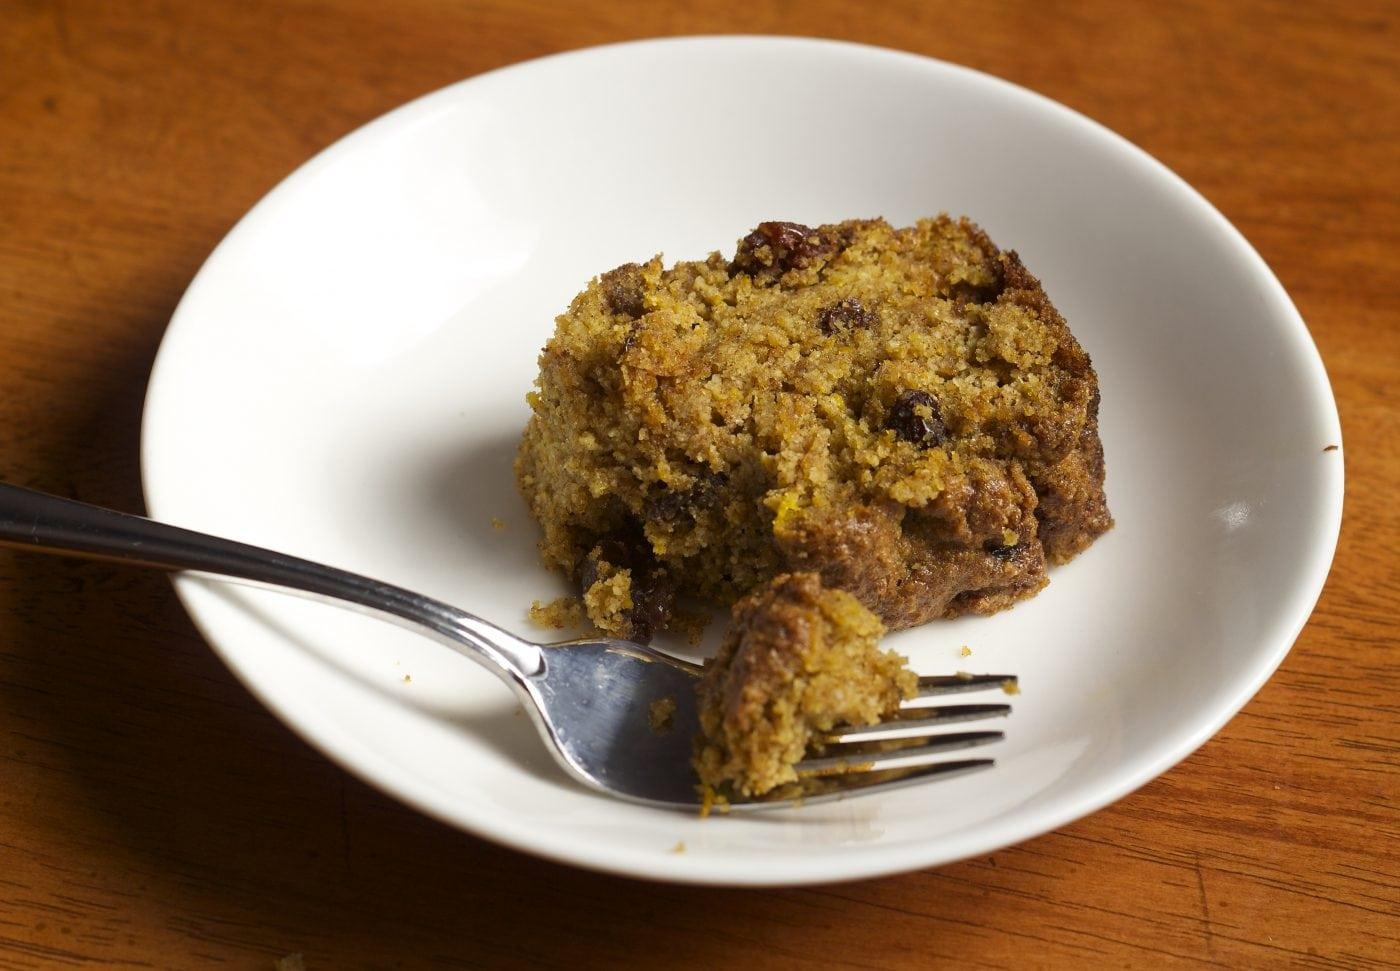 Best-Ever Paleo Zucchini Raisin Bread